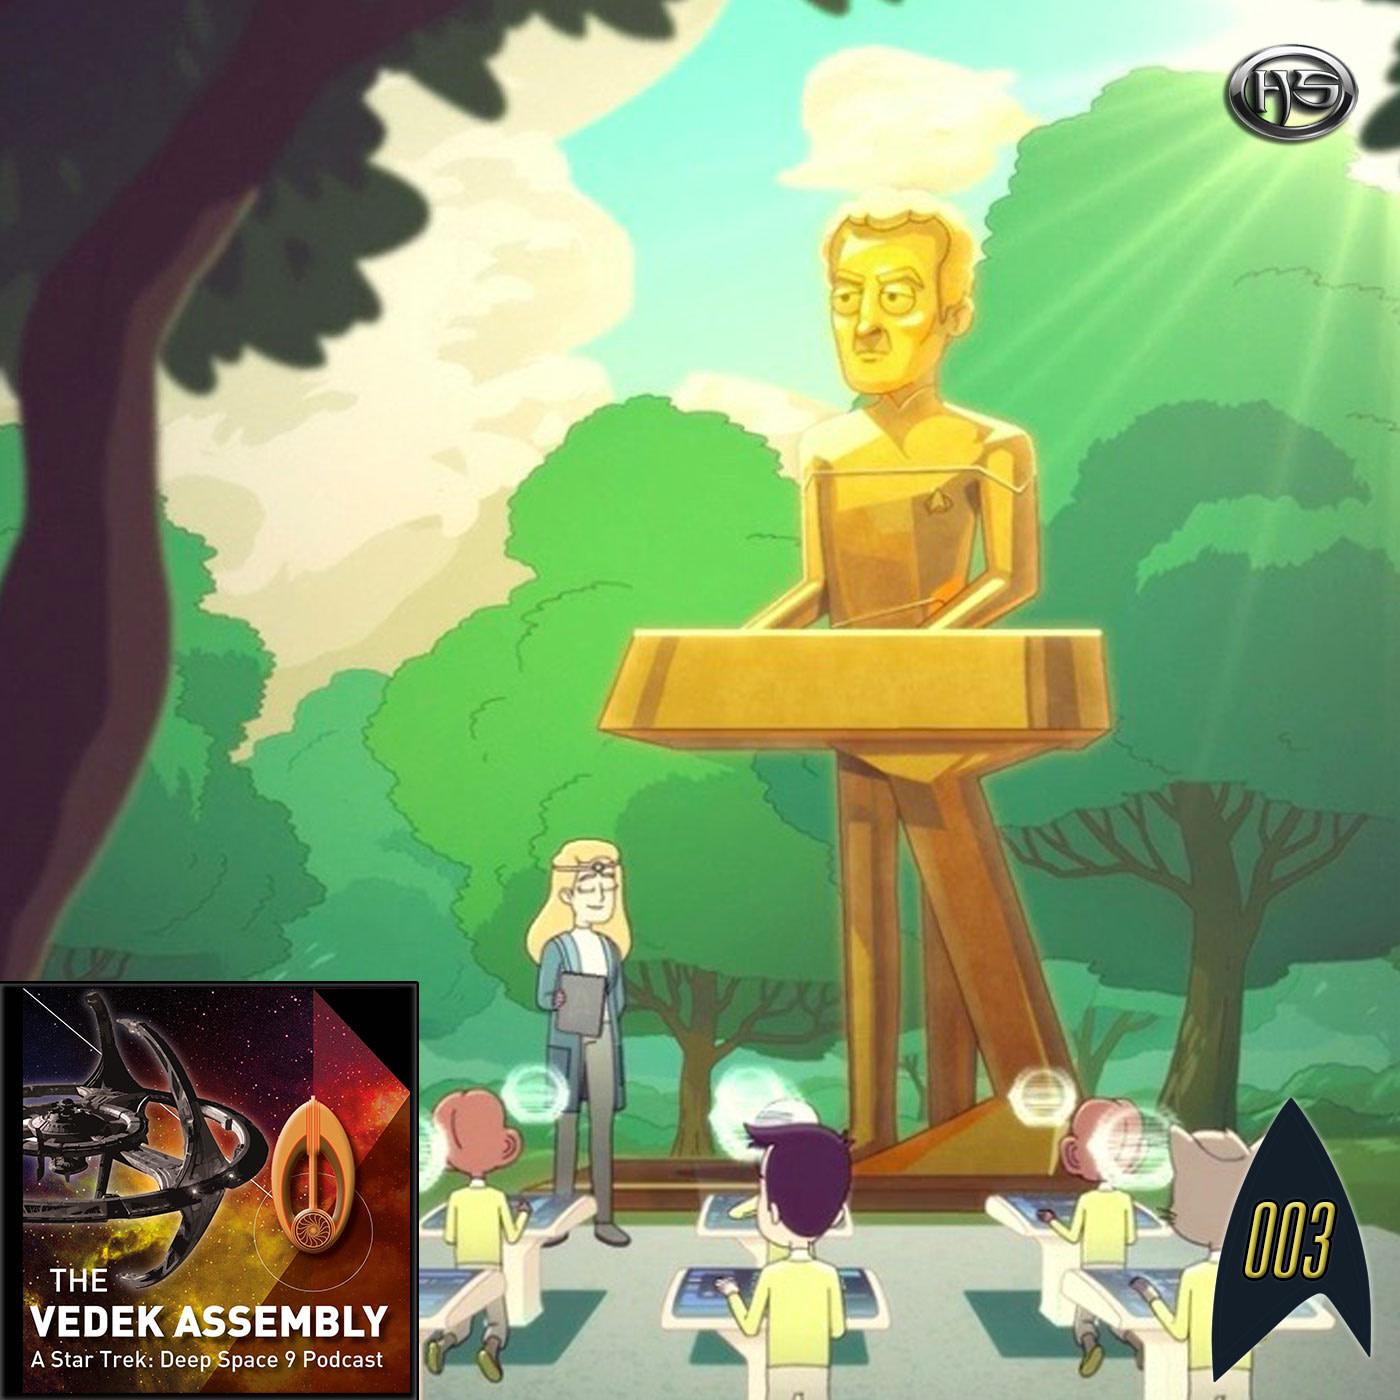 The Vedek Assembly Episode 3